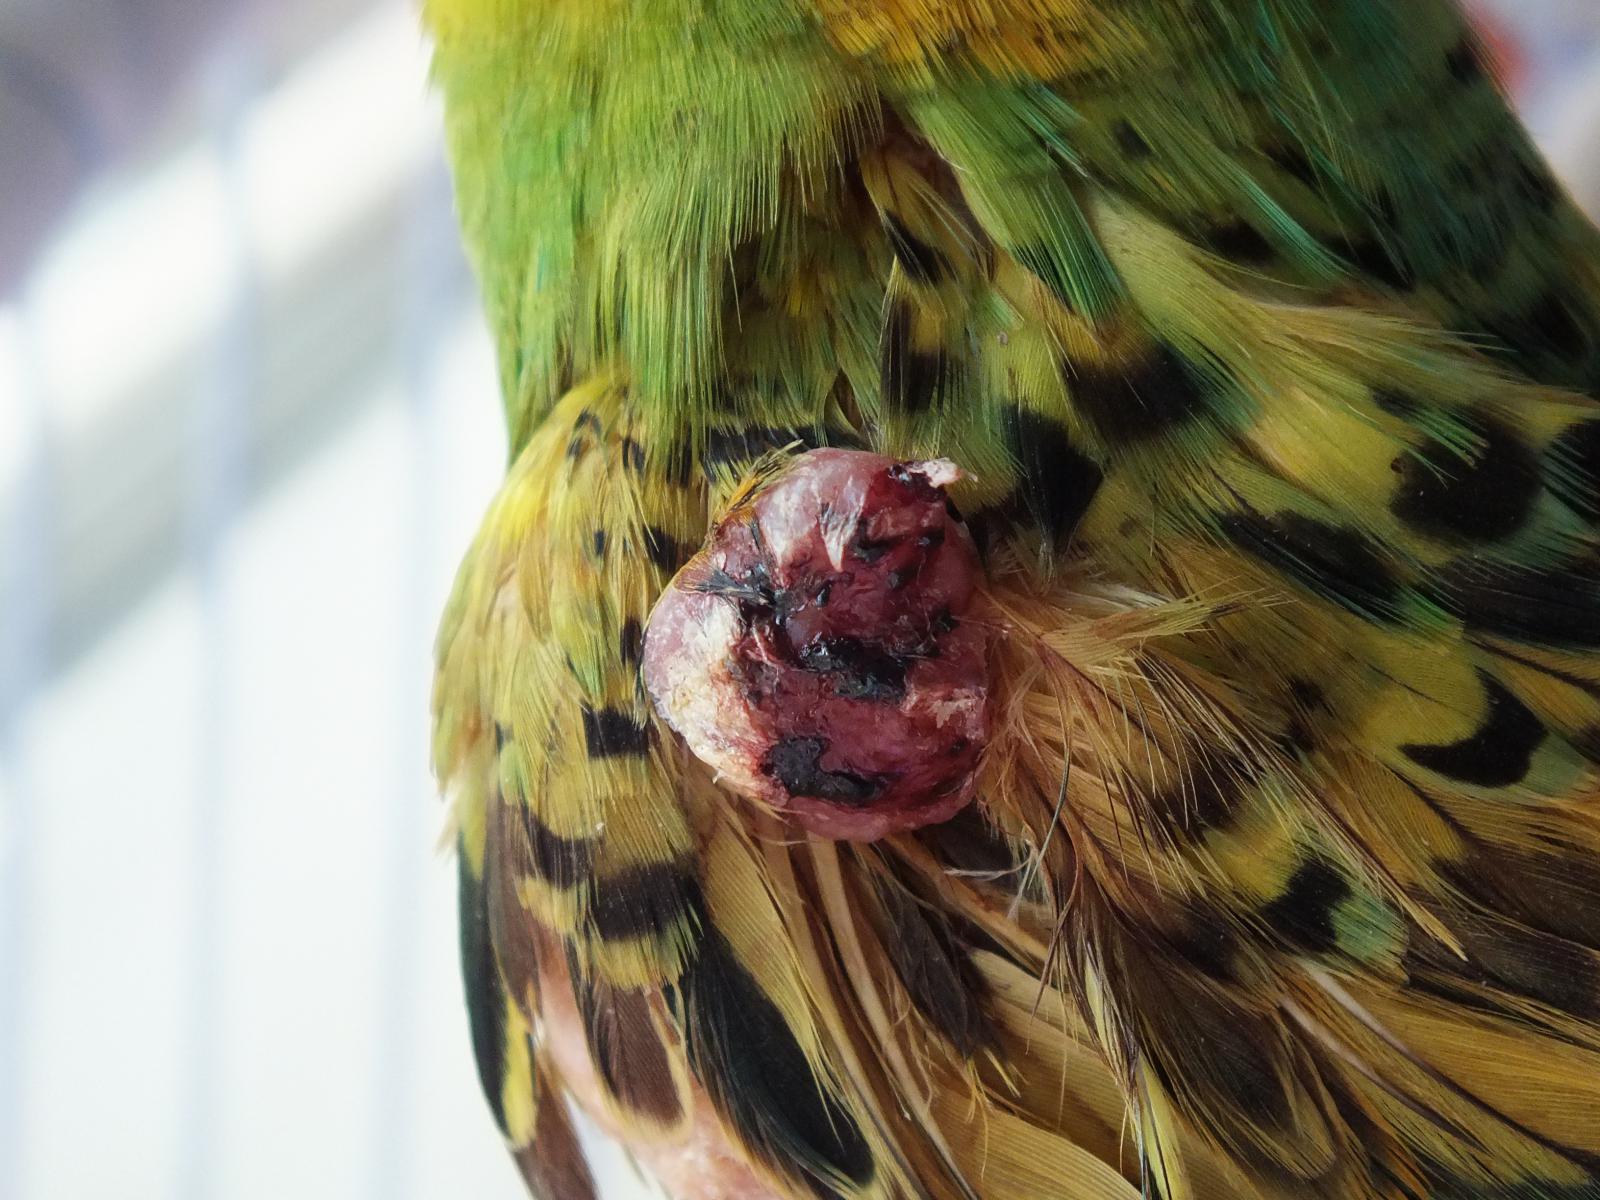 опухоль на крыле - DSCF8947.JPG